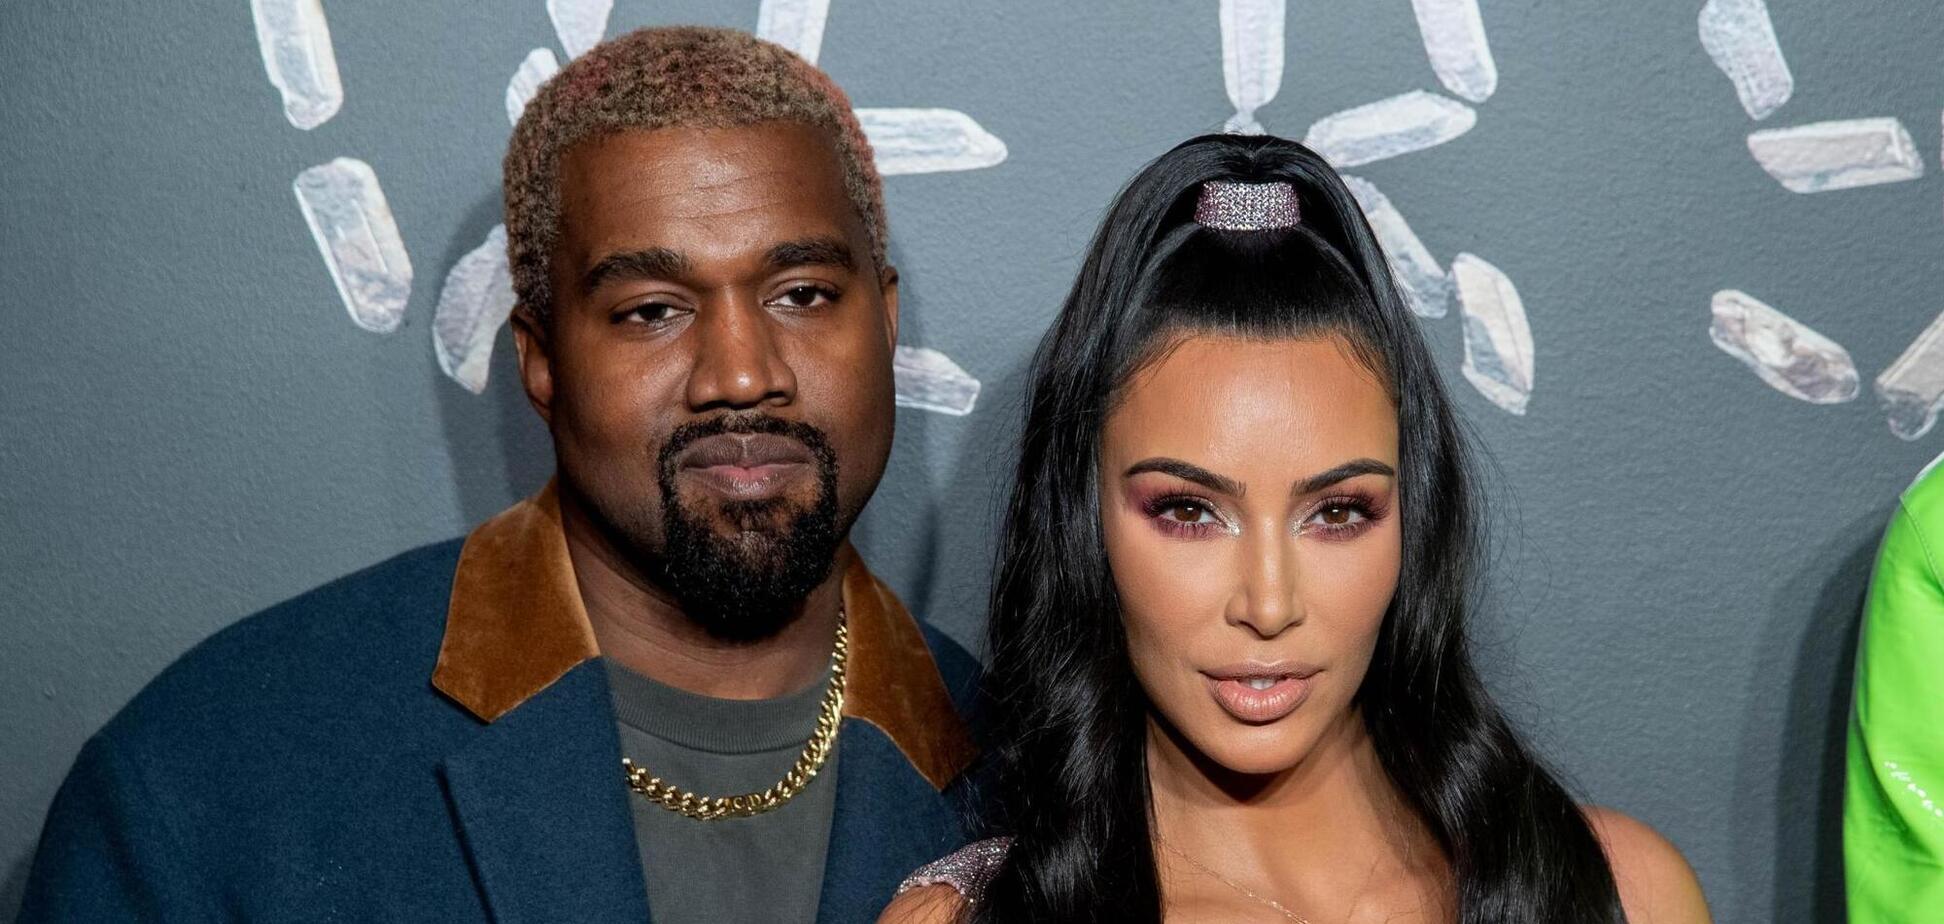 Канье Уэст и Ким Кардашьян поцелуем на камеру опровергли слухи о разводе